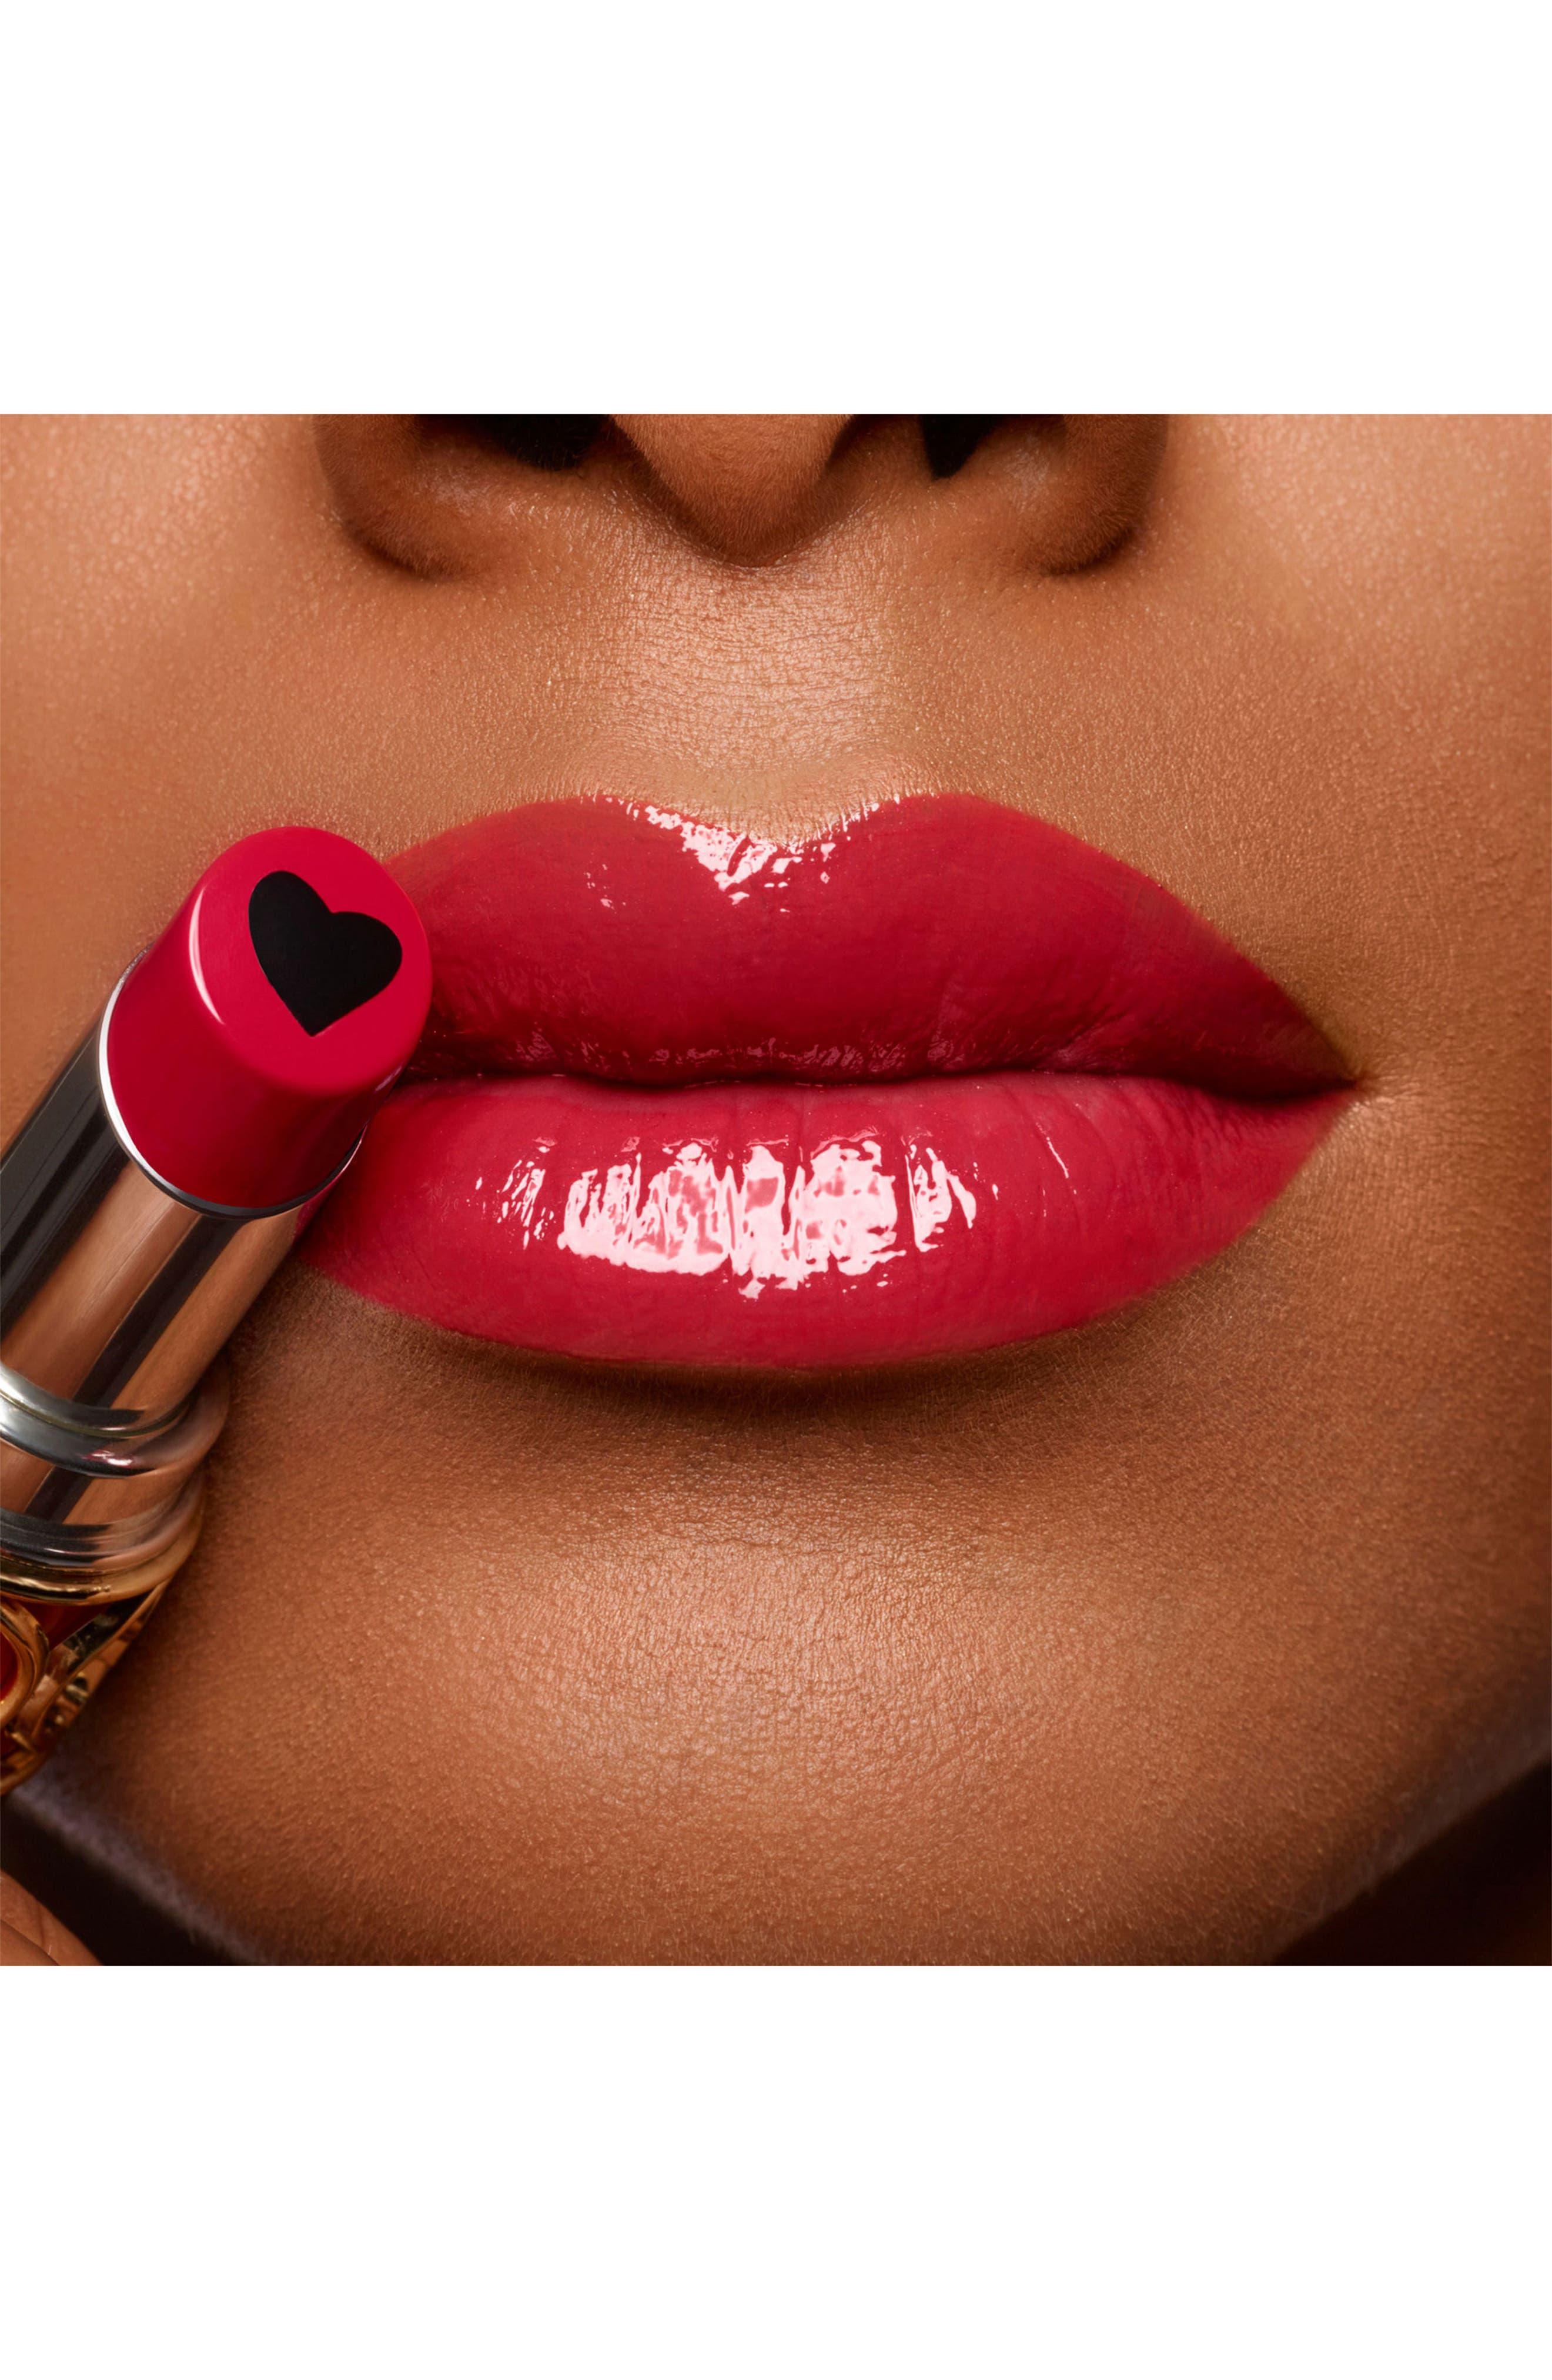 Volupté Plump-in-Color Plumping Lip Balm,                             Alternate thumbnail 4, color,                             06 LUNATIC RED